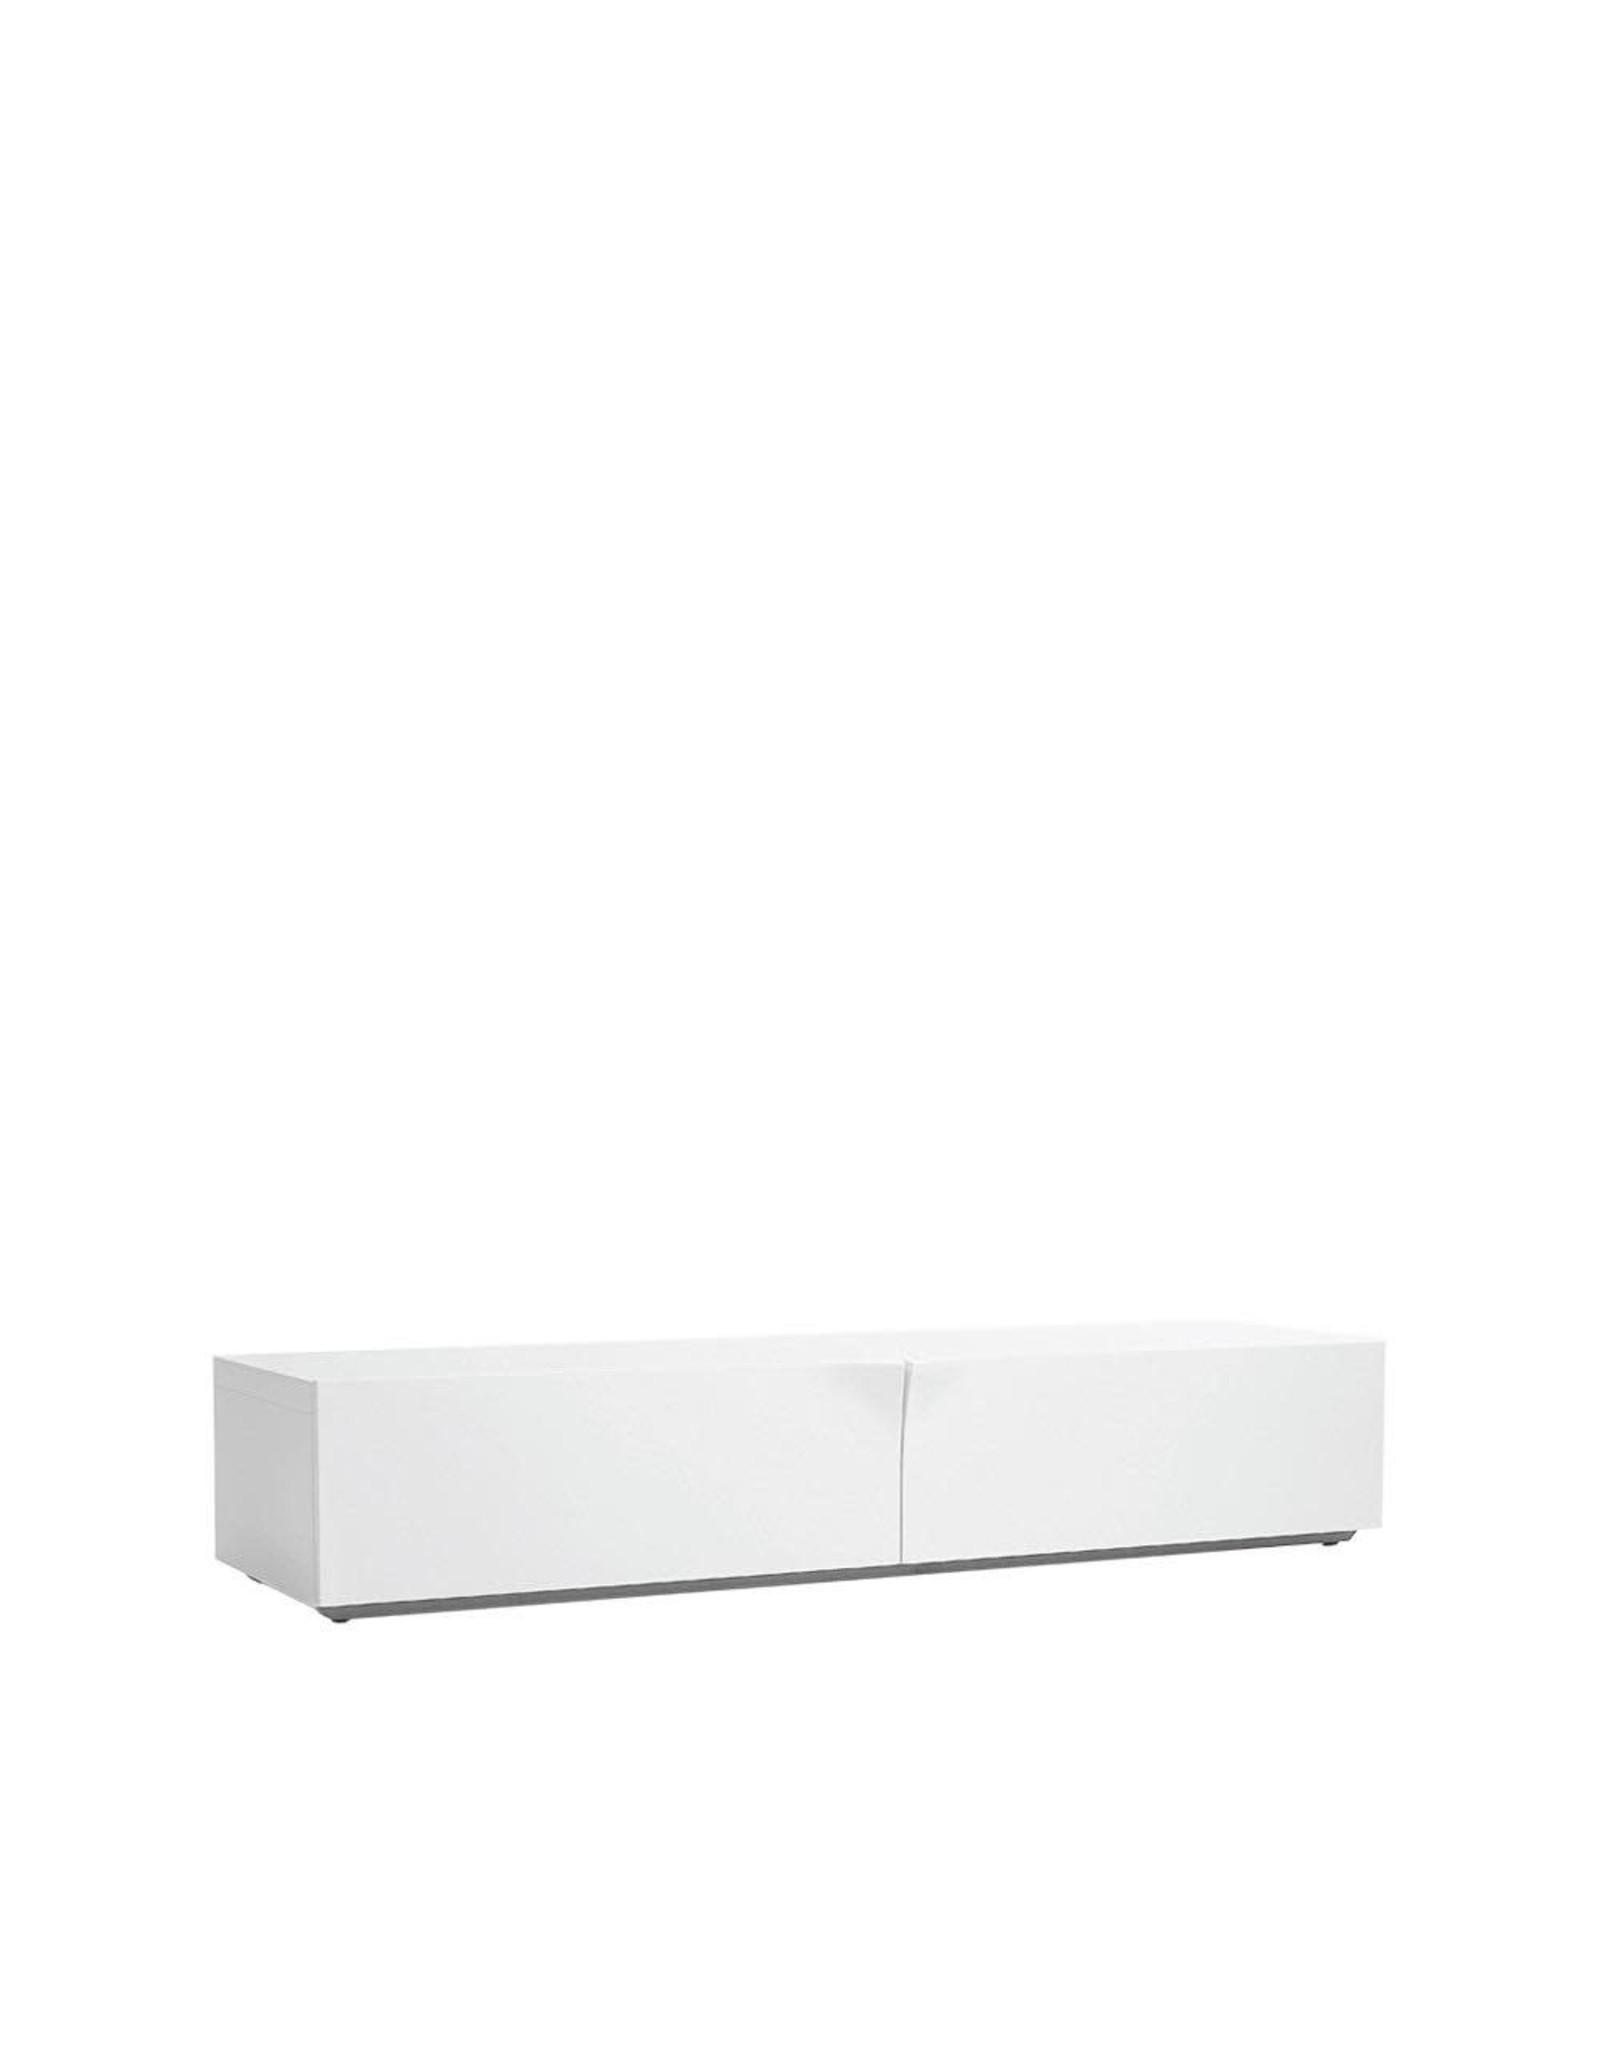 KARL ANDERSSON & SÖNER BI751 MRS. BILL 白色漆面電視櫃